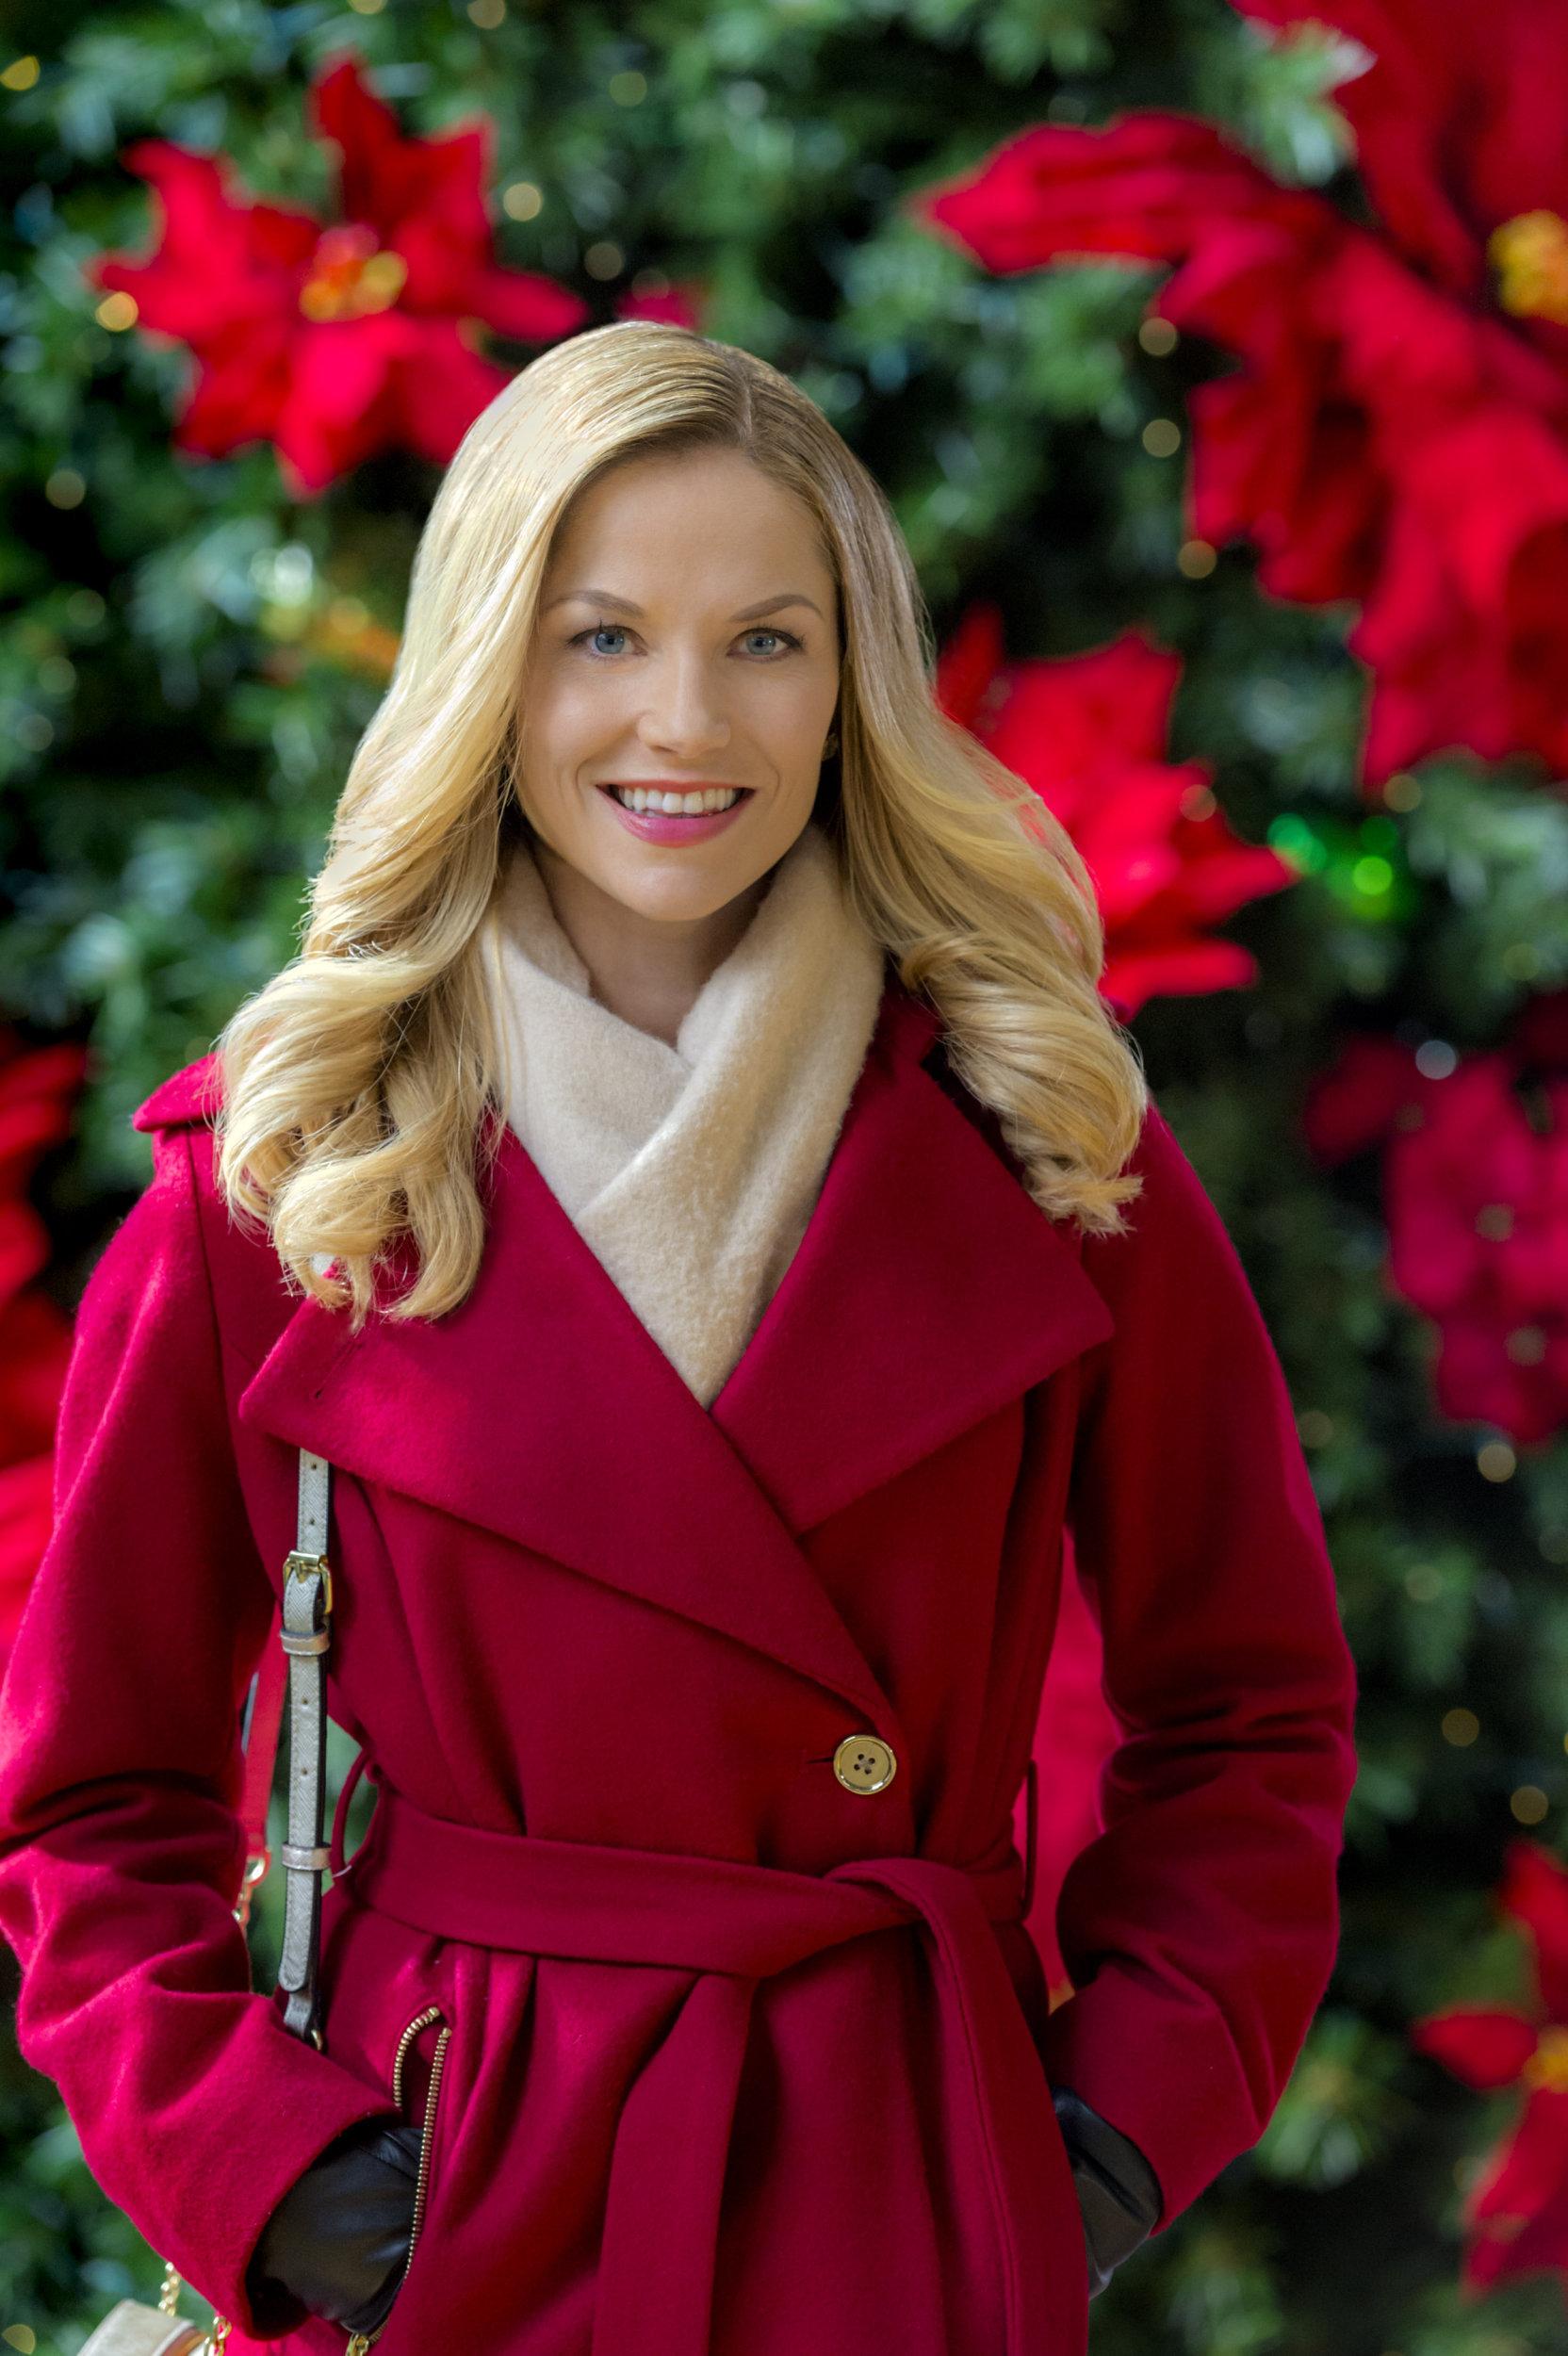 Ellen Hollman on Sharing Christmas | Hallmark Channel